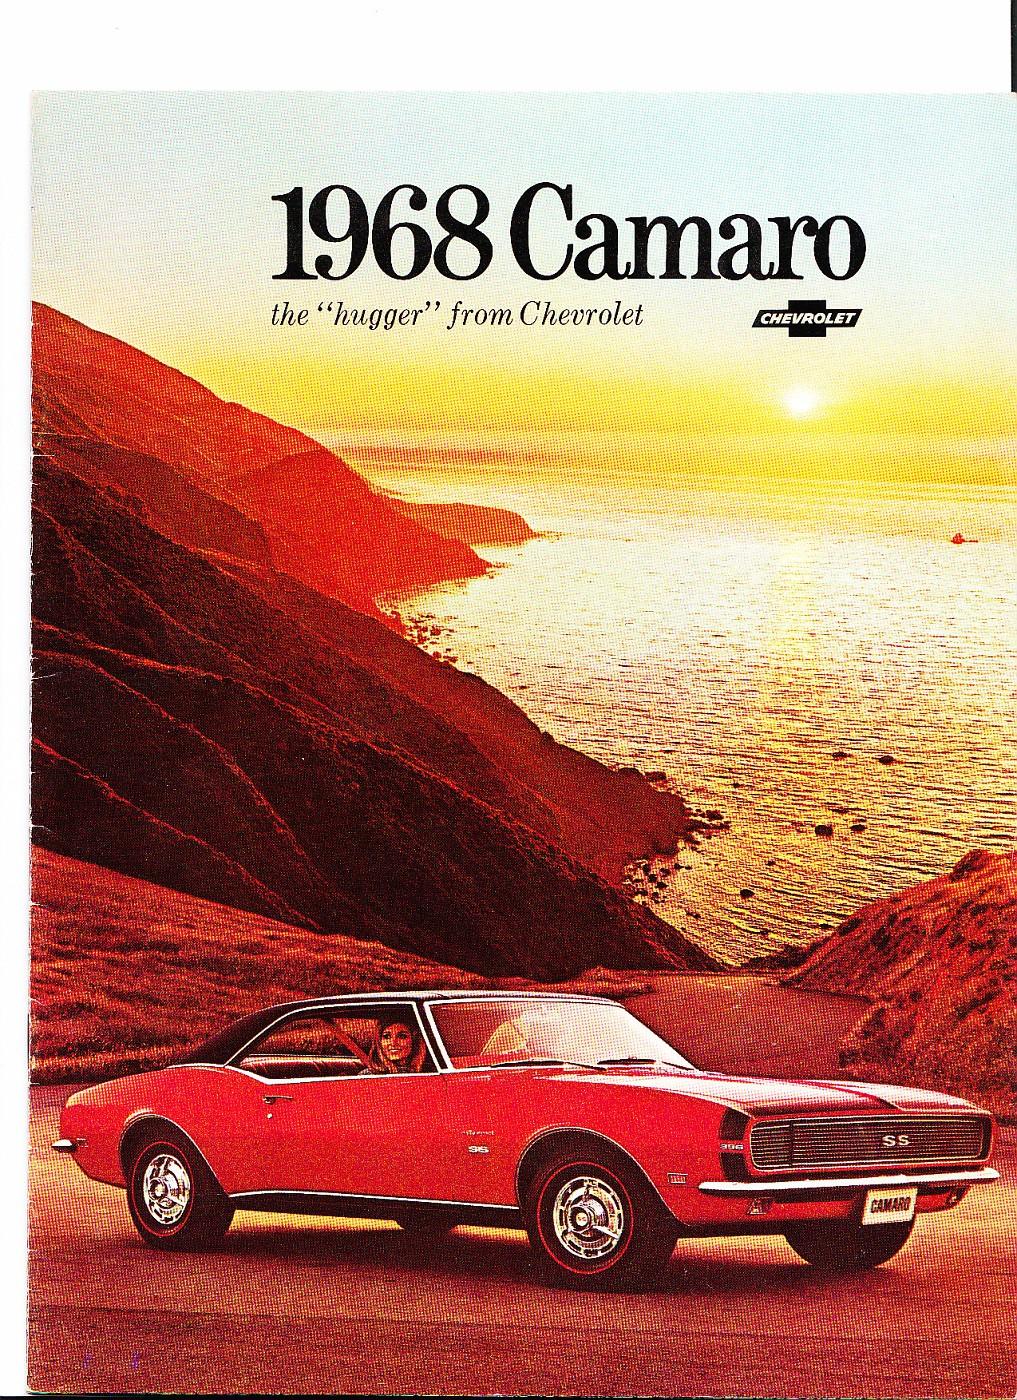 La Der de l'année : Chevy Camaro '68 Photo1-vi